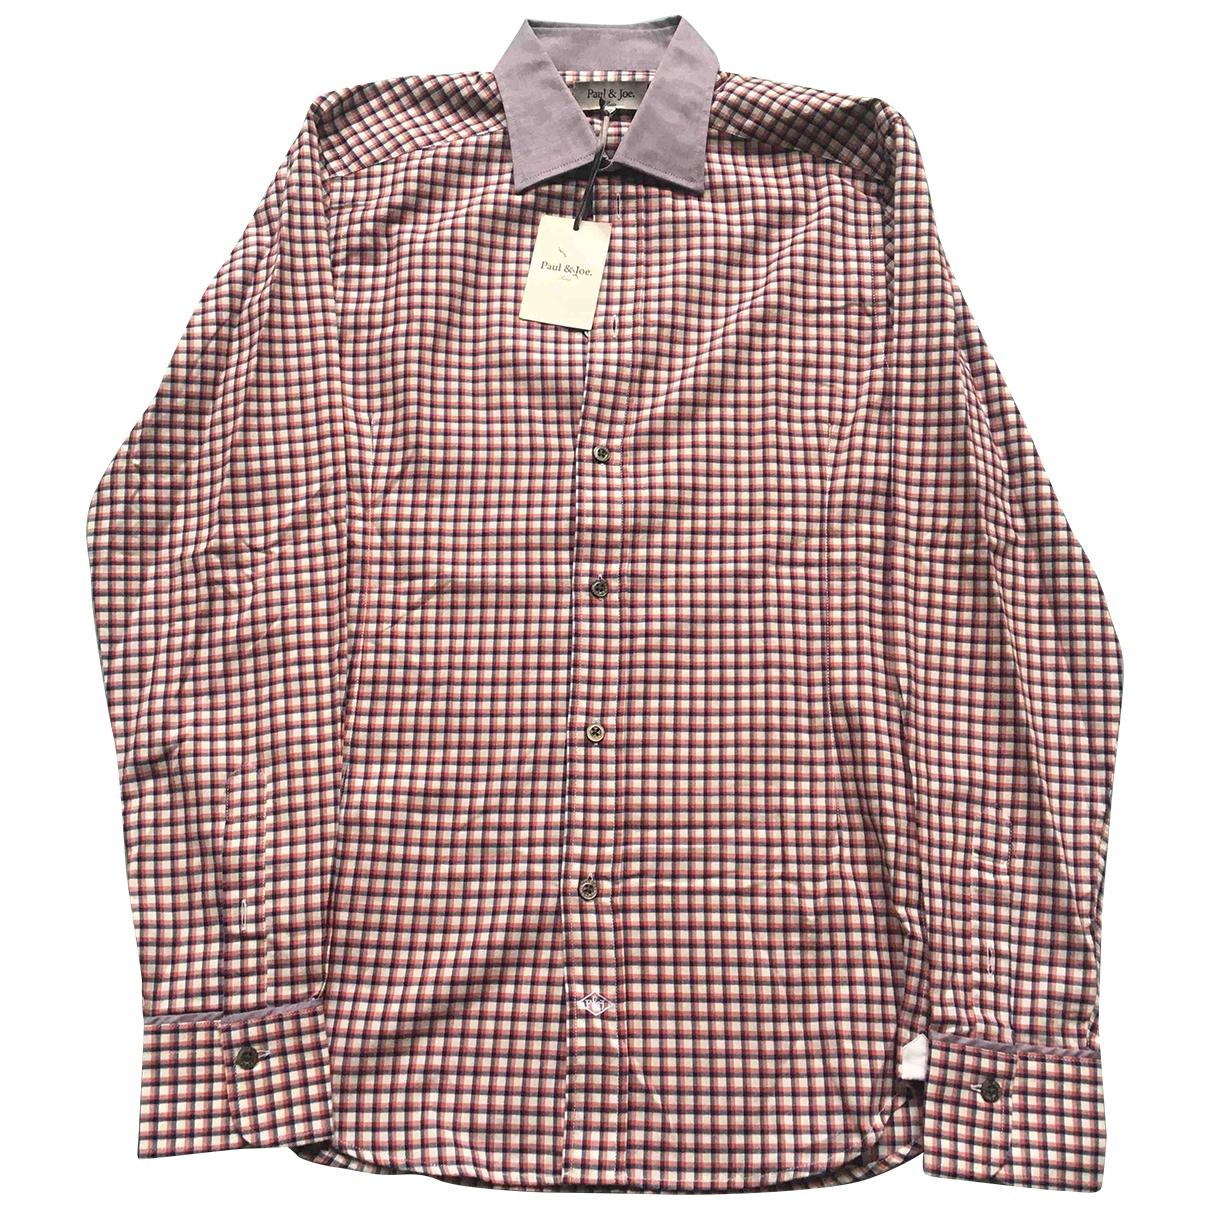 Paul & Joe \N Purple Cotton Shirts for Men XS International